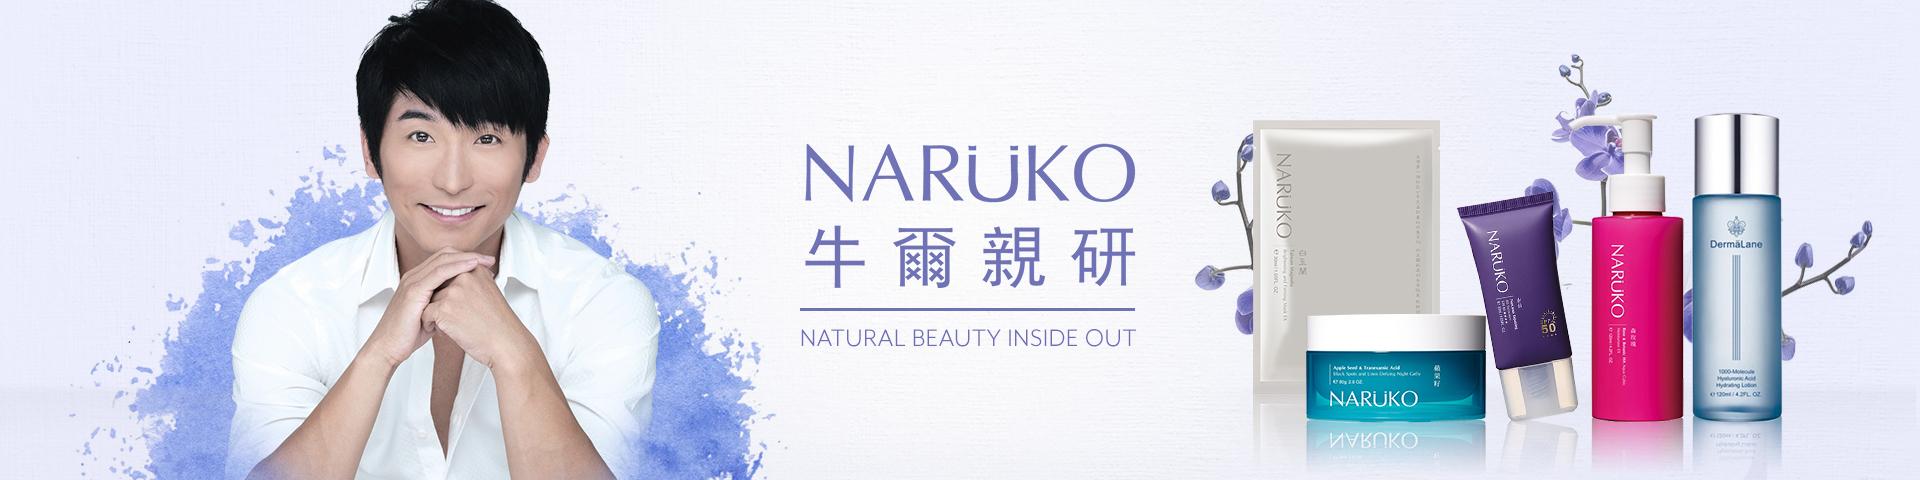 Naruko Flagship - Top Banner